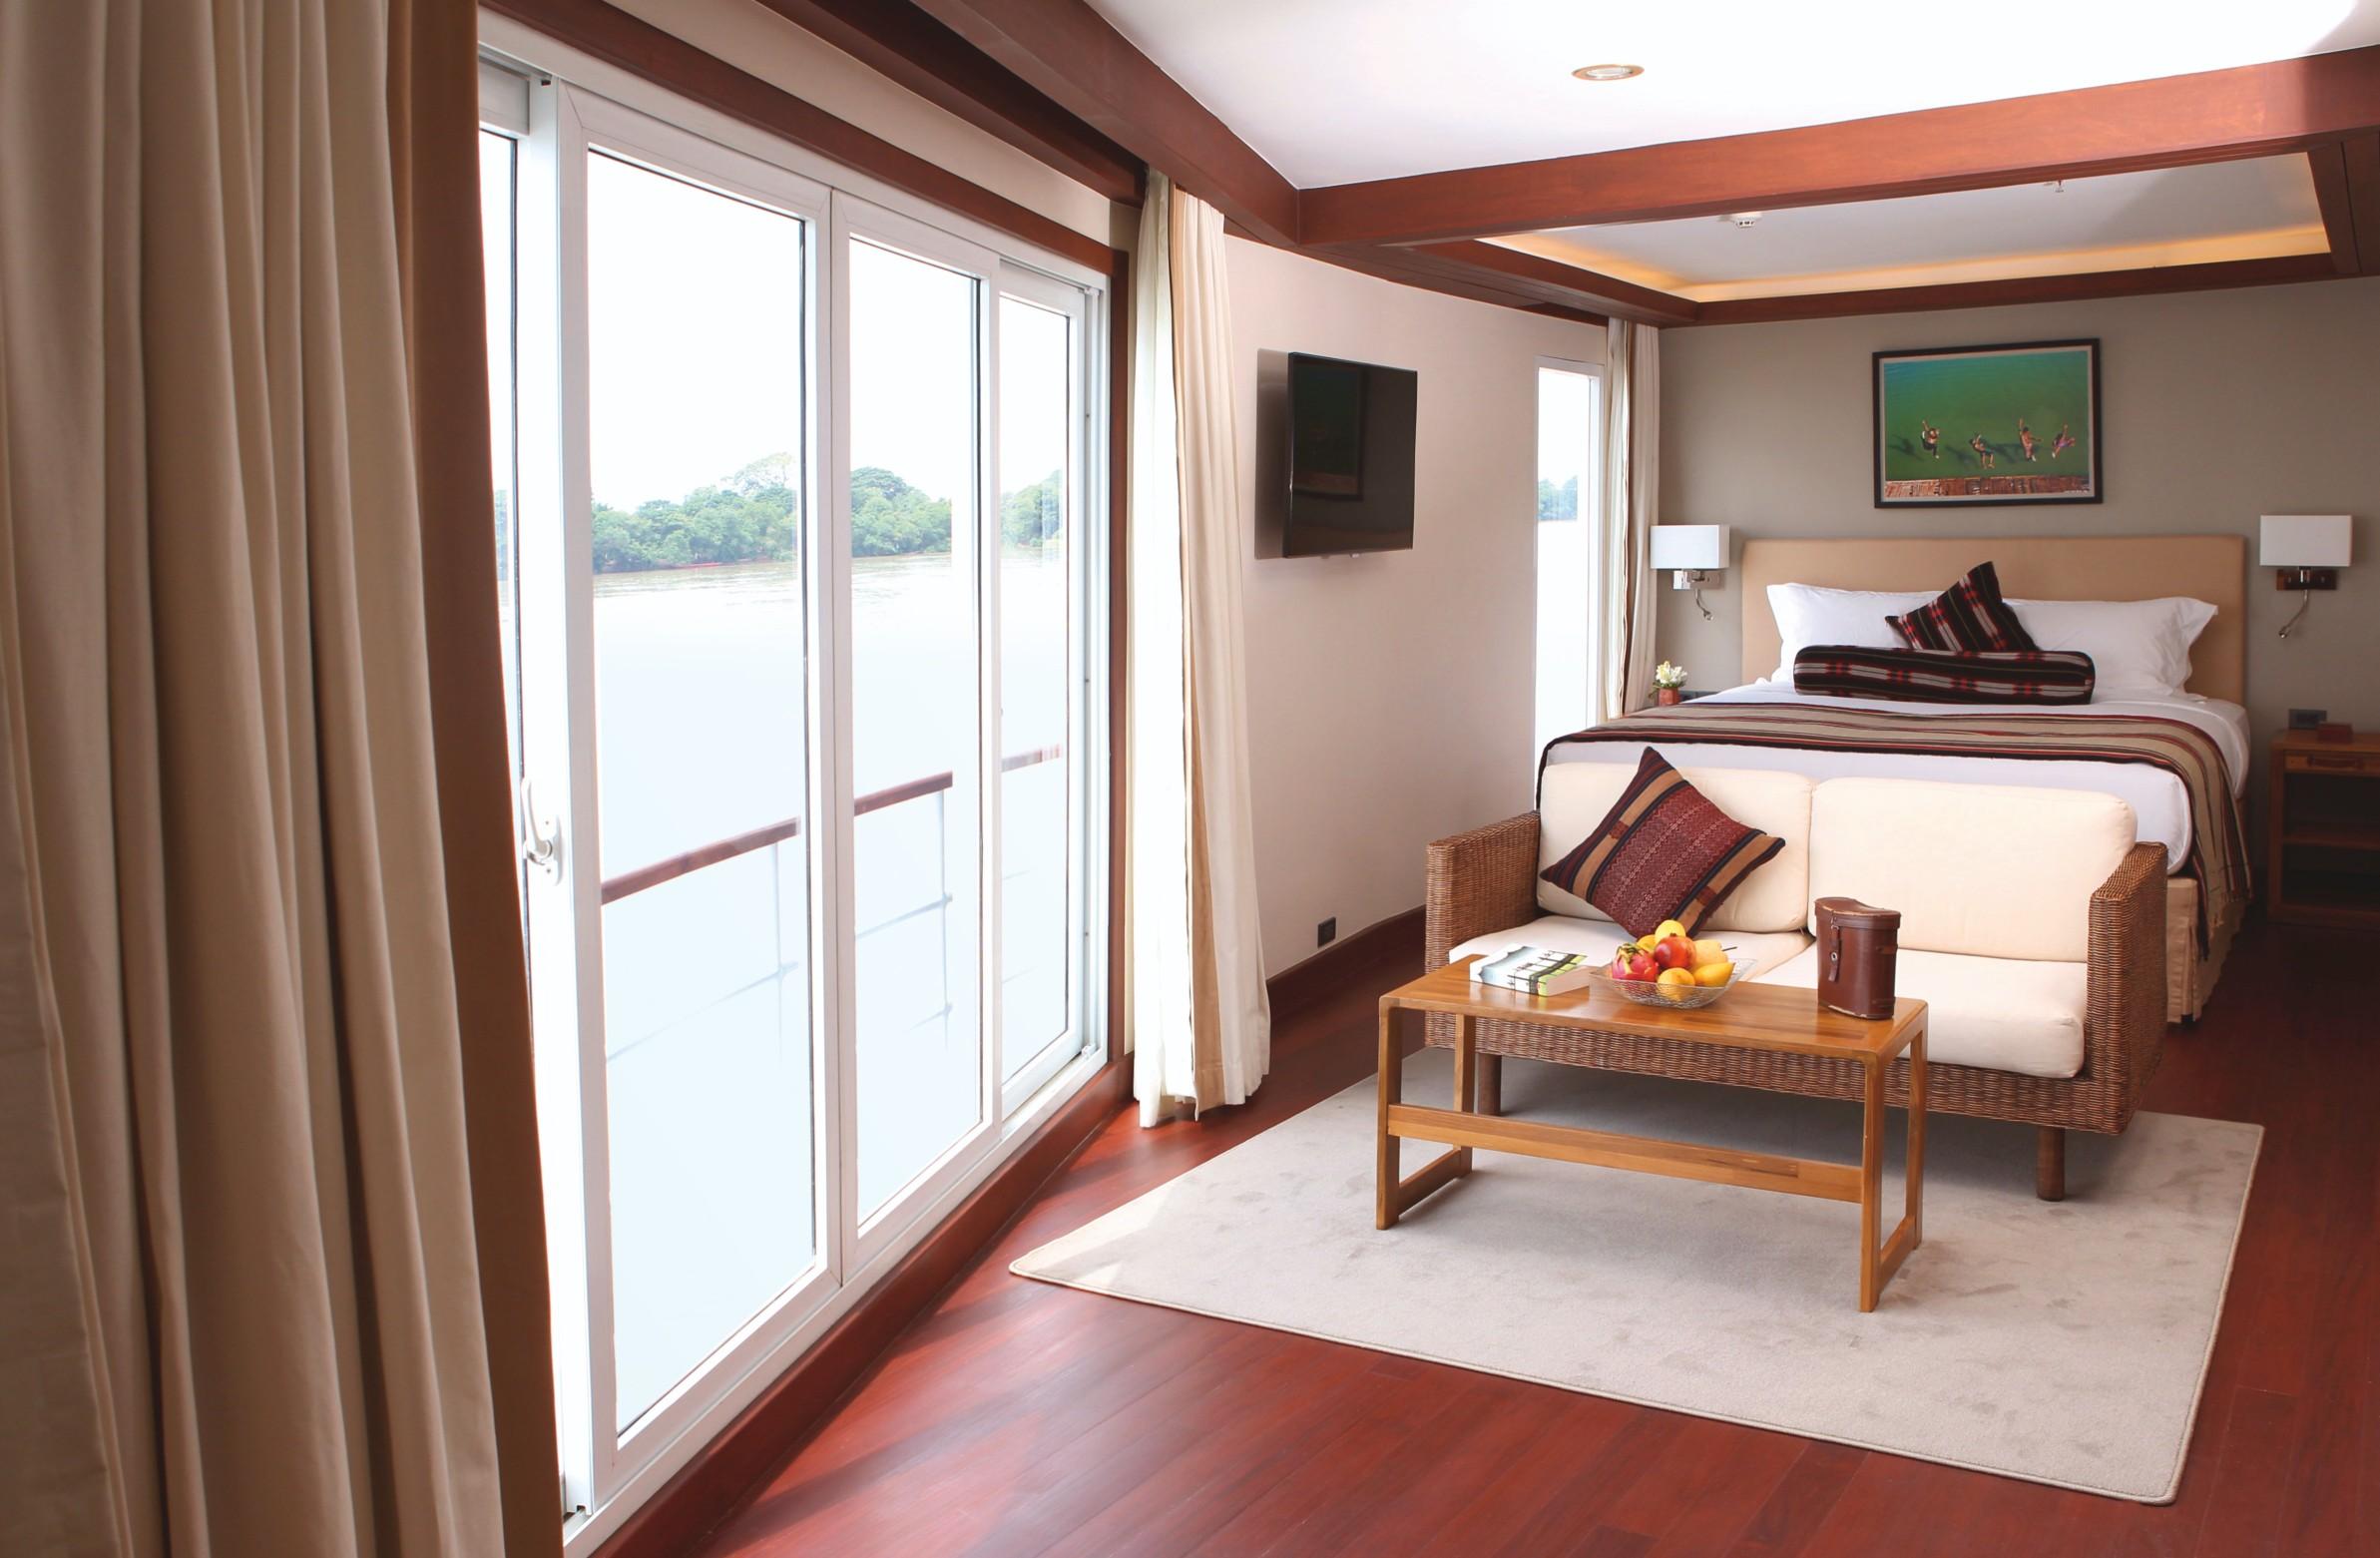 Belmond River Cruises Belmond Orcaella Accommodation Cabin 14.jpg